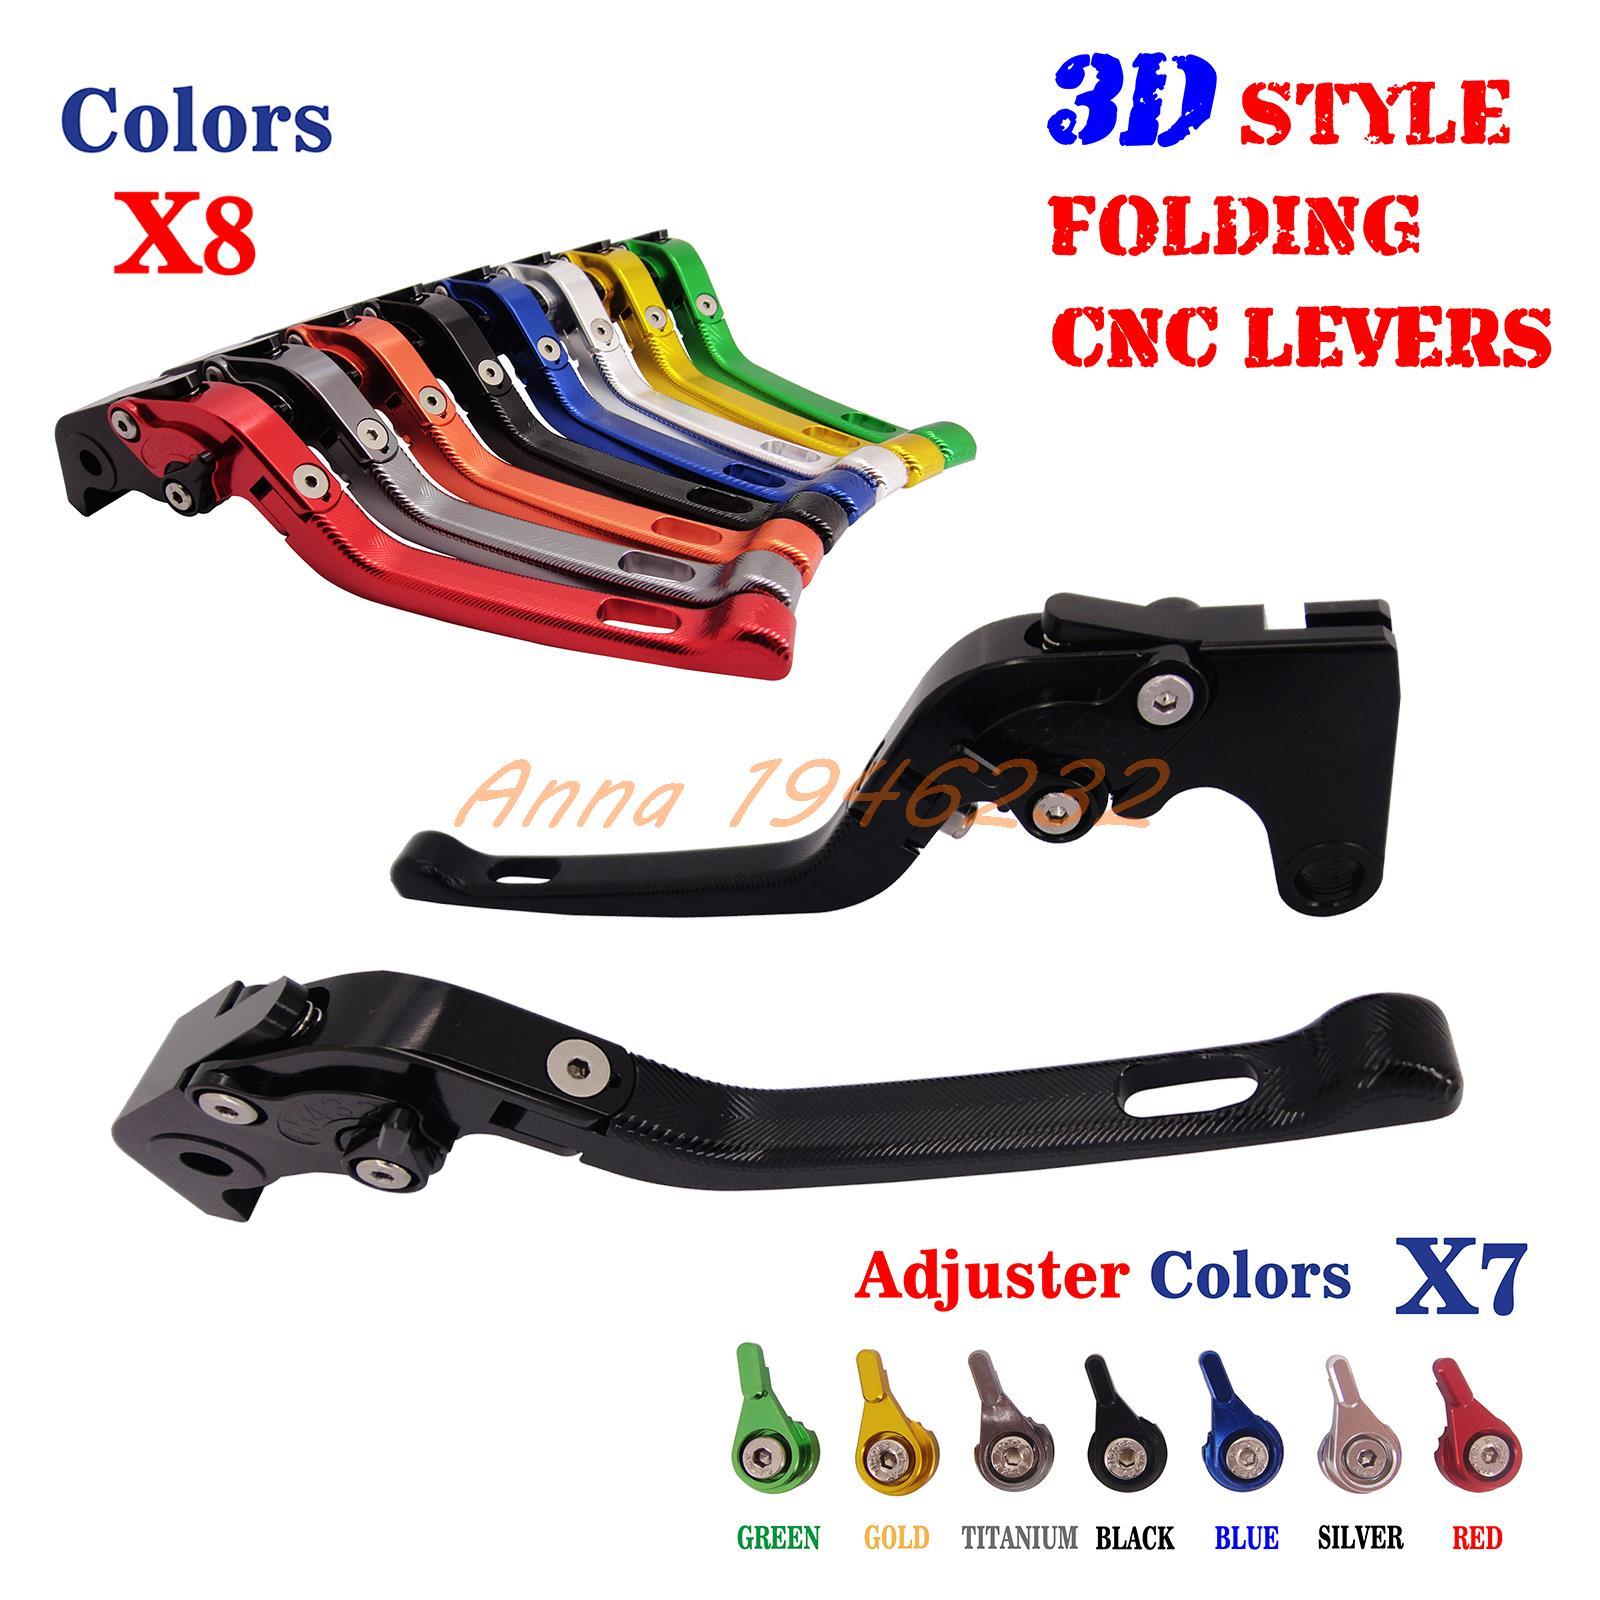 CNC 3D Style Folding Adjustable Brake Clutch Lever For Yamaha XJR400 1993-2007 FZ400 1997 FZS600 Fazer 1998-2003FZS 600 NEW 04 05 06 07 08 09 10 11 12 13 14 new cnc short straight adjustable brake clutch lever for yamaha majesty 400 t max 500 t max 530